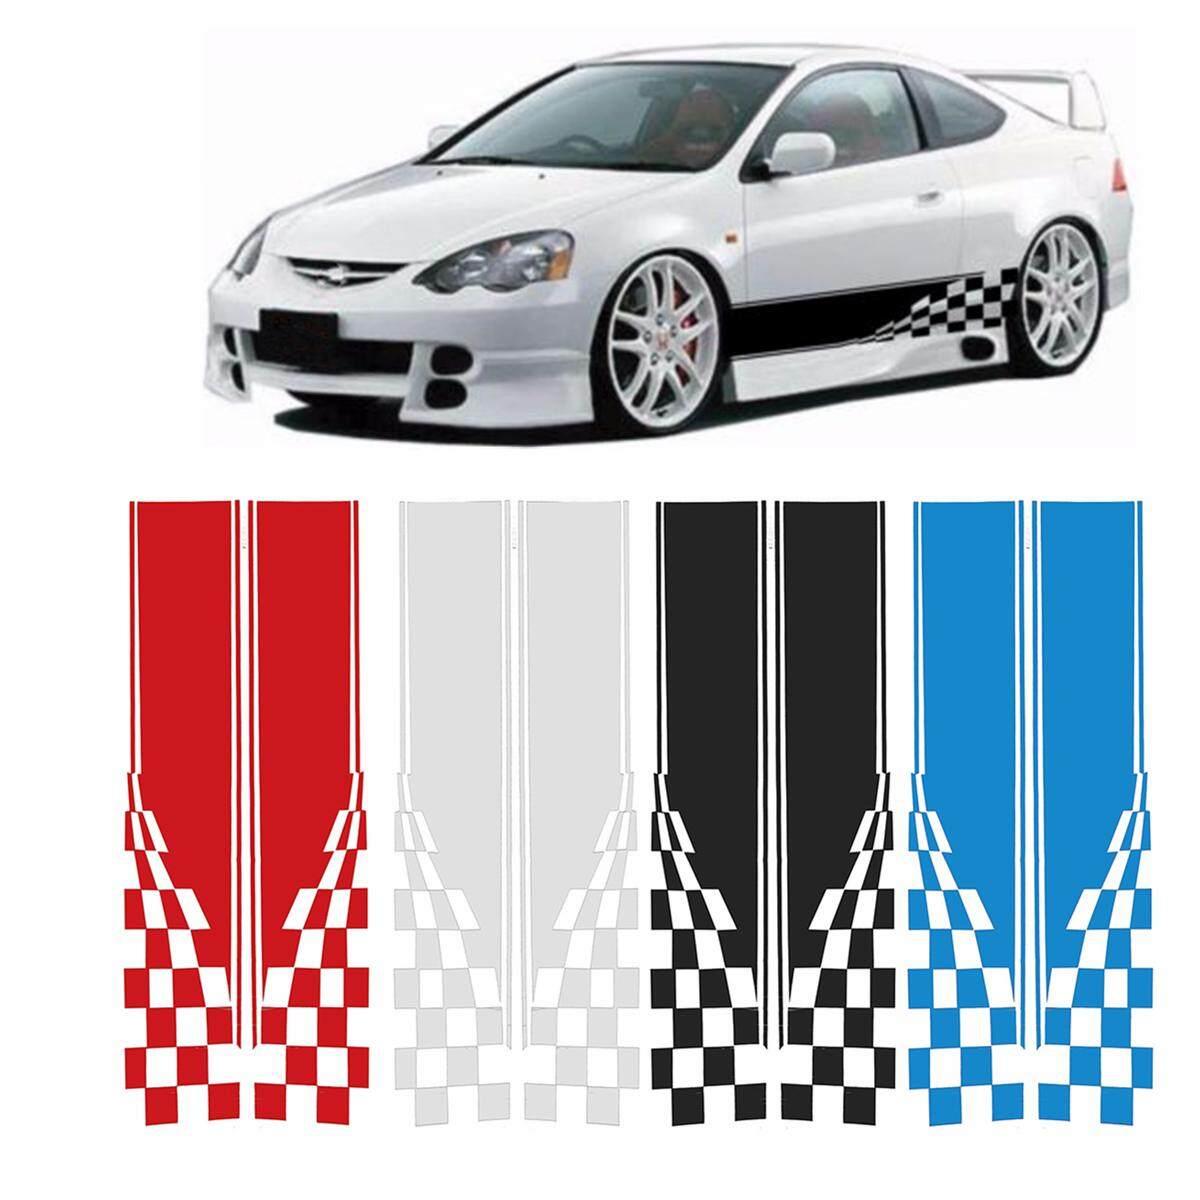 2X Black Checkered Flag Decals Sports Racing Race Car Long Stripe Vinyl Decals